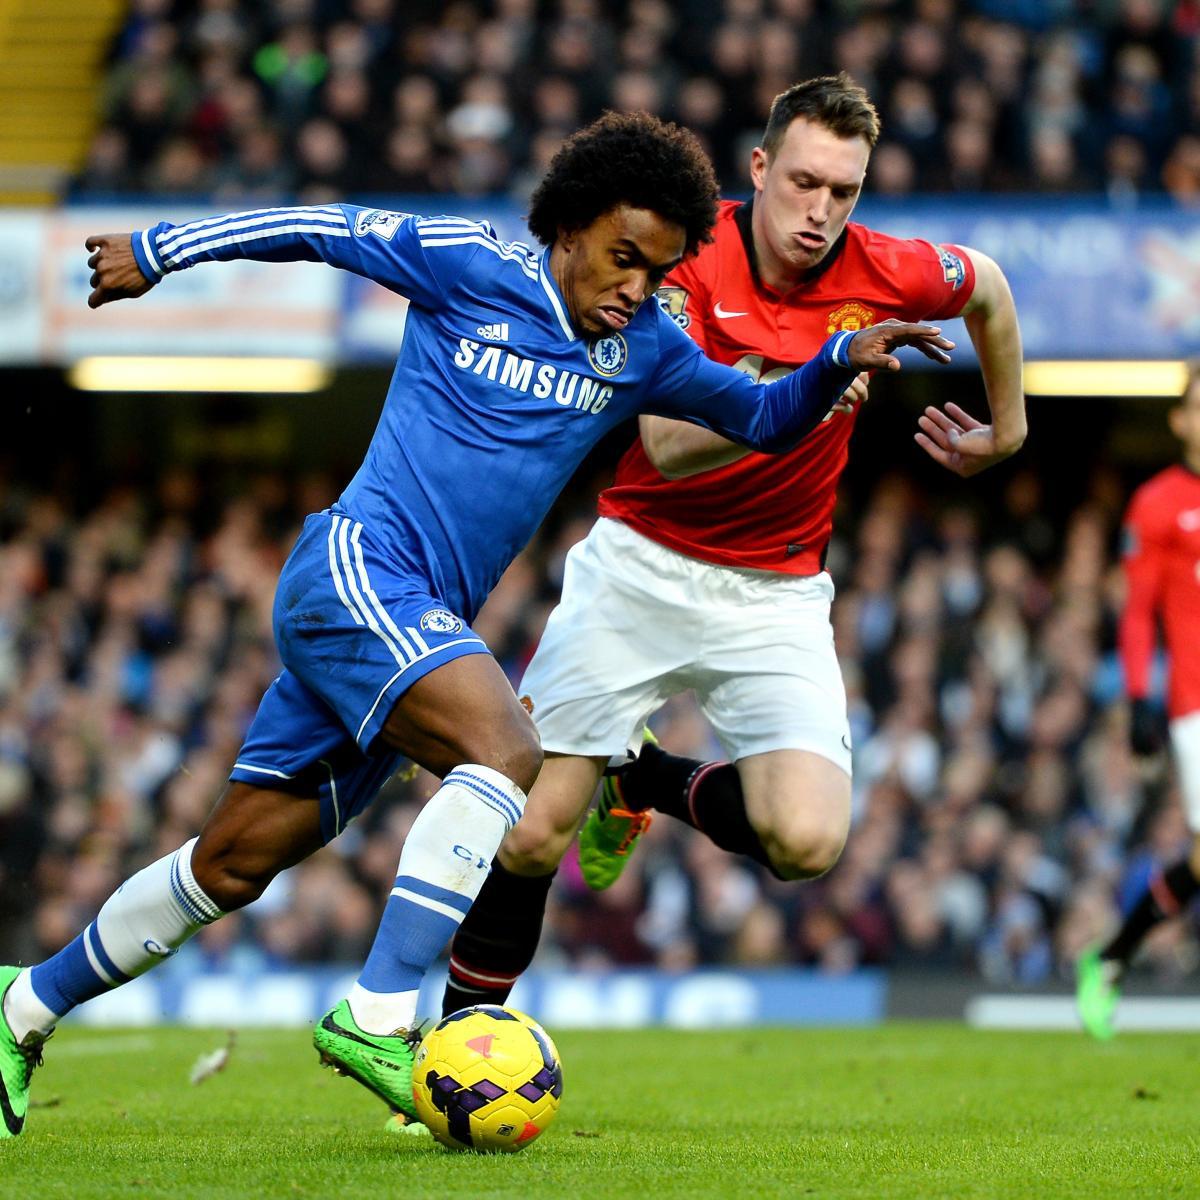 Psg Vs Manchester City Live Score Highlights From: Chelsea Vs. Manchester United: Premier League Live Score